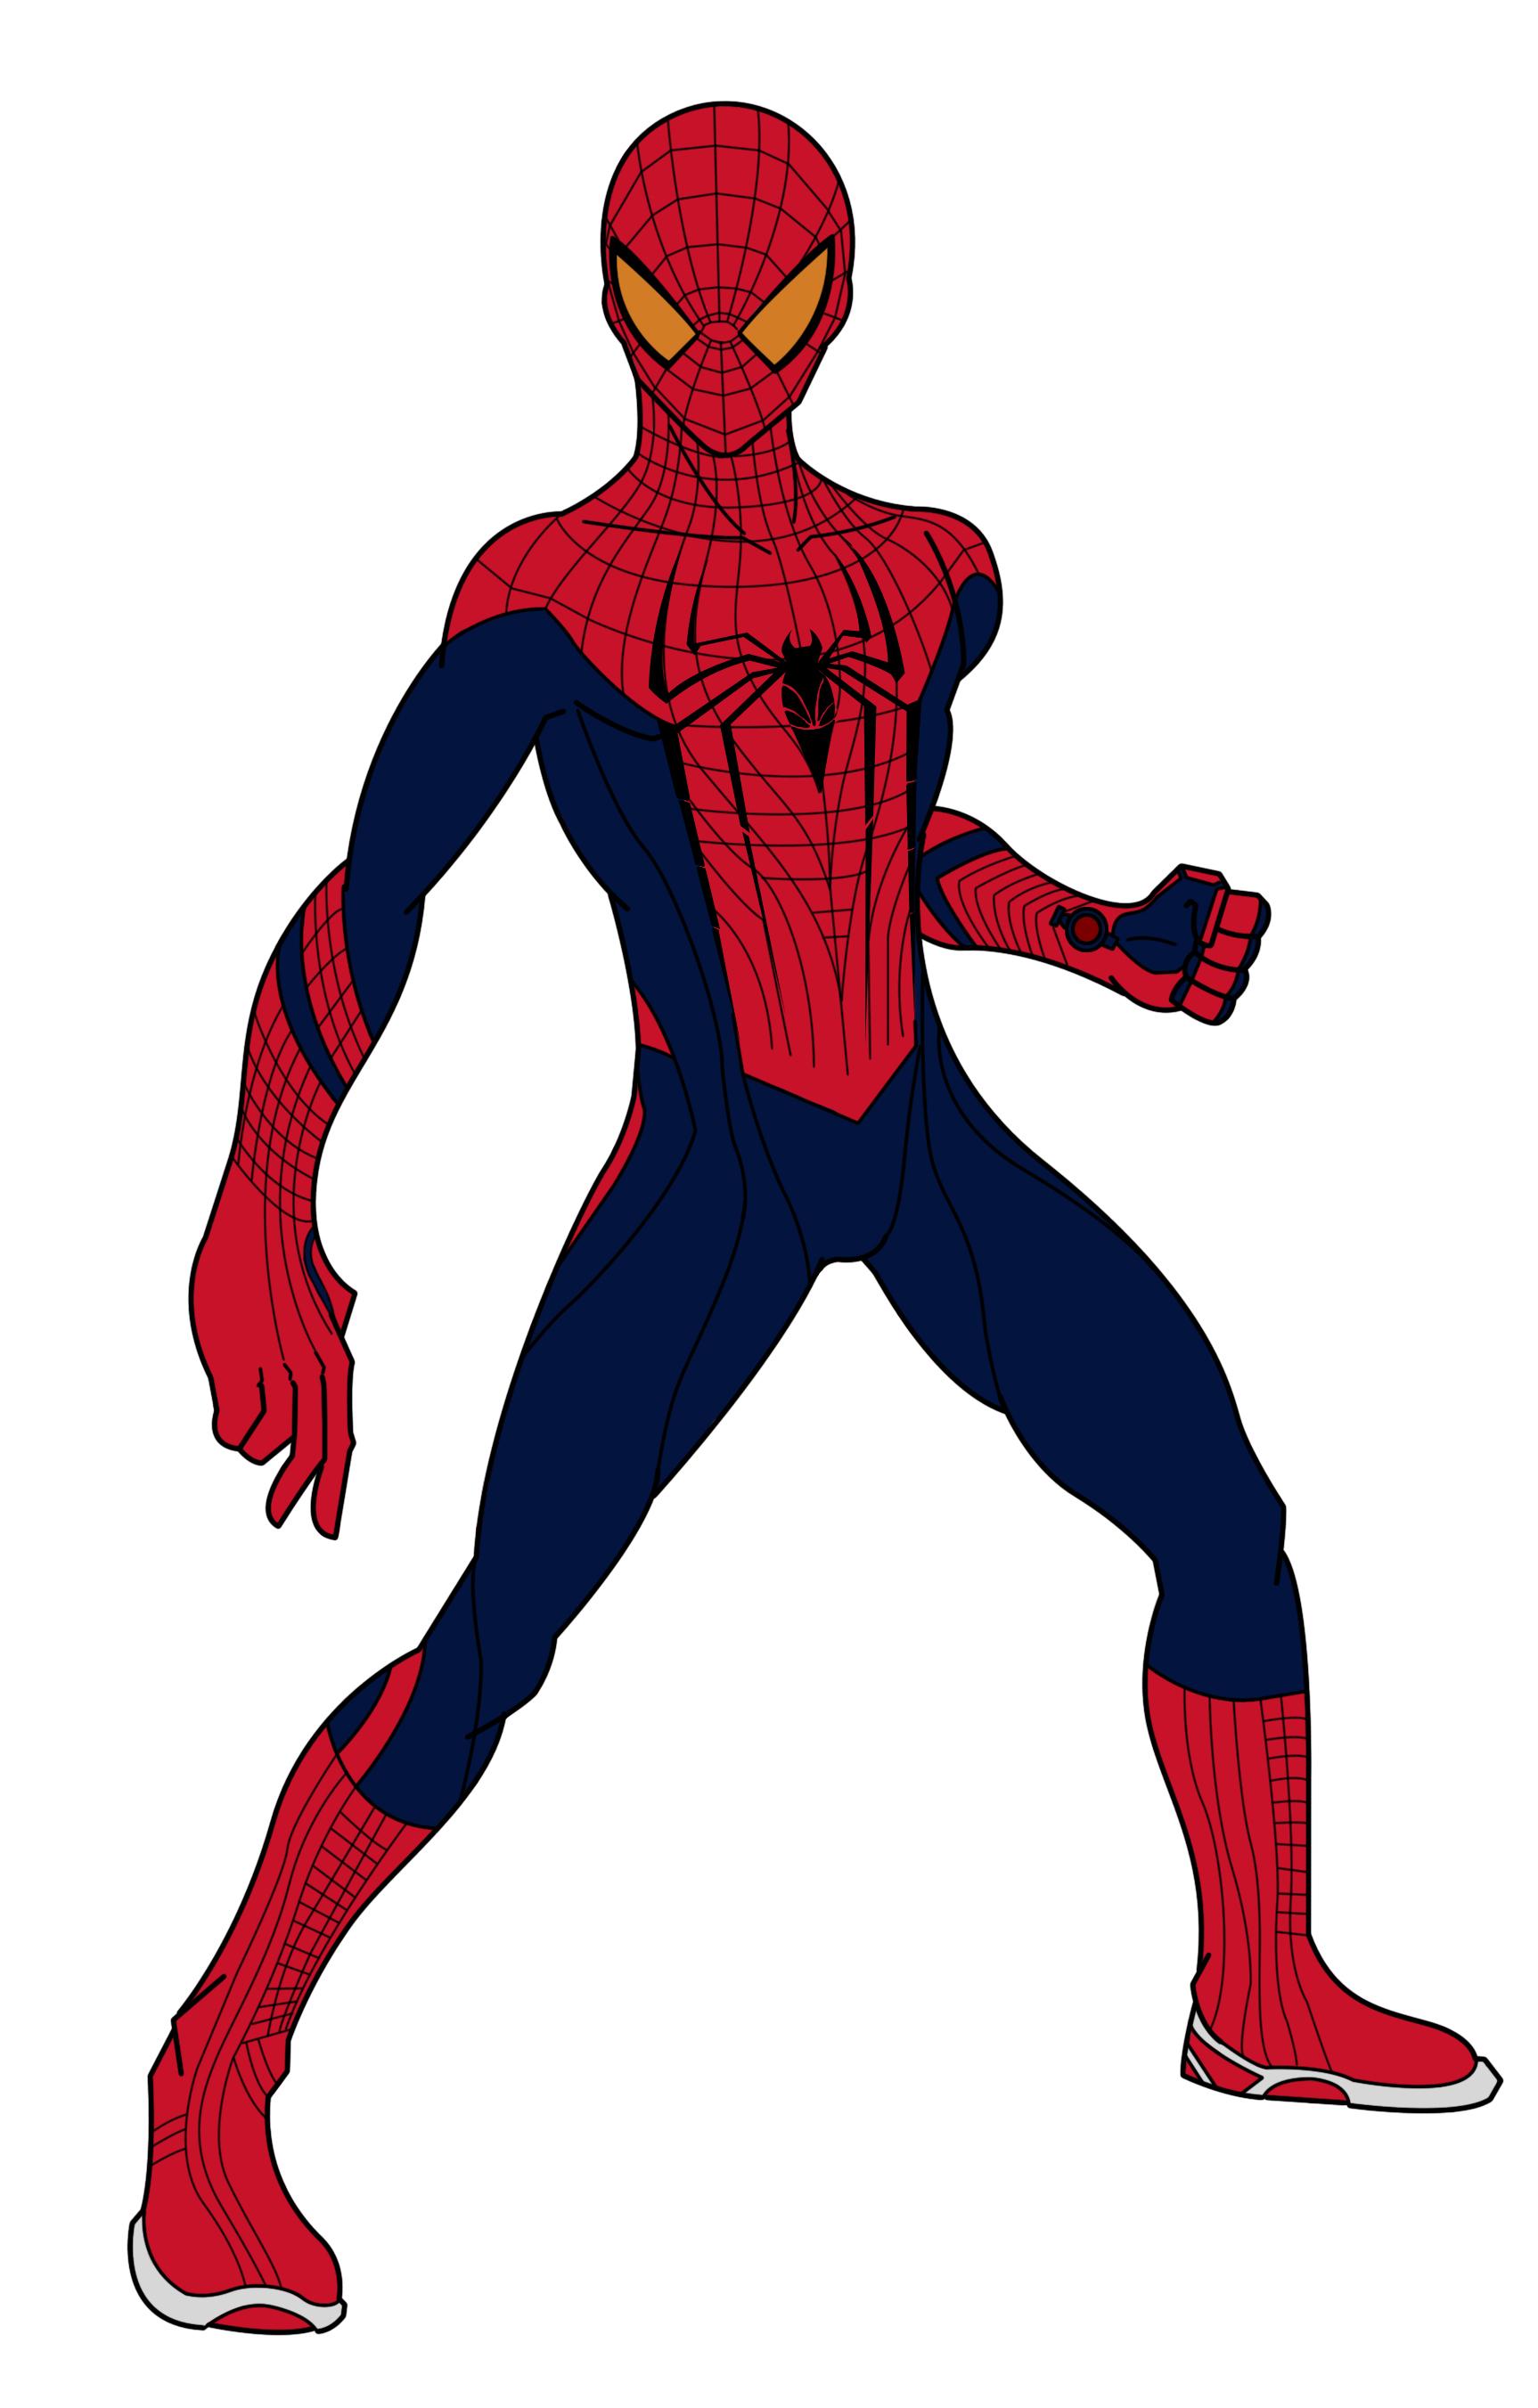 Spiderman clipart deviantart ClipArt Animation Collection Spiderman Clipart